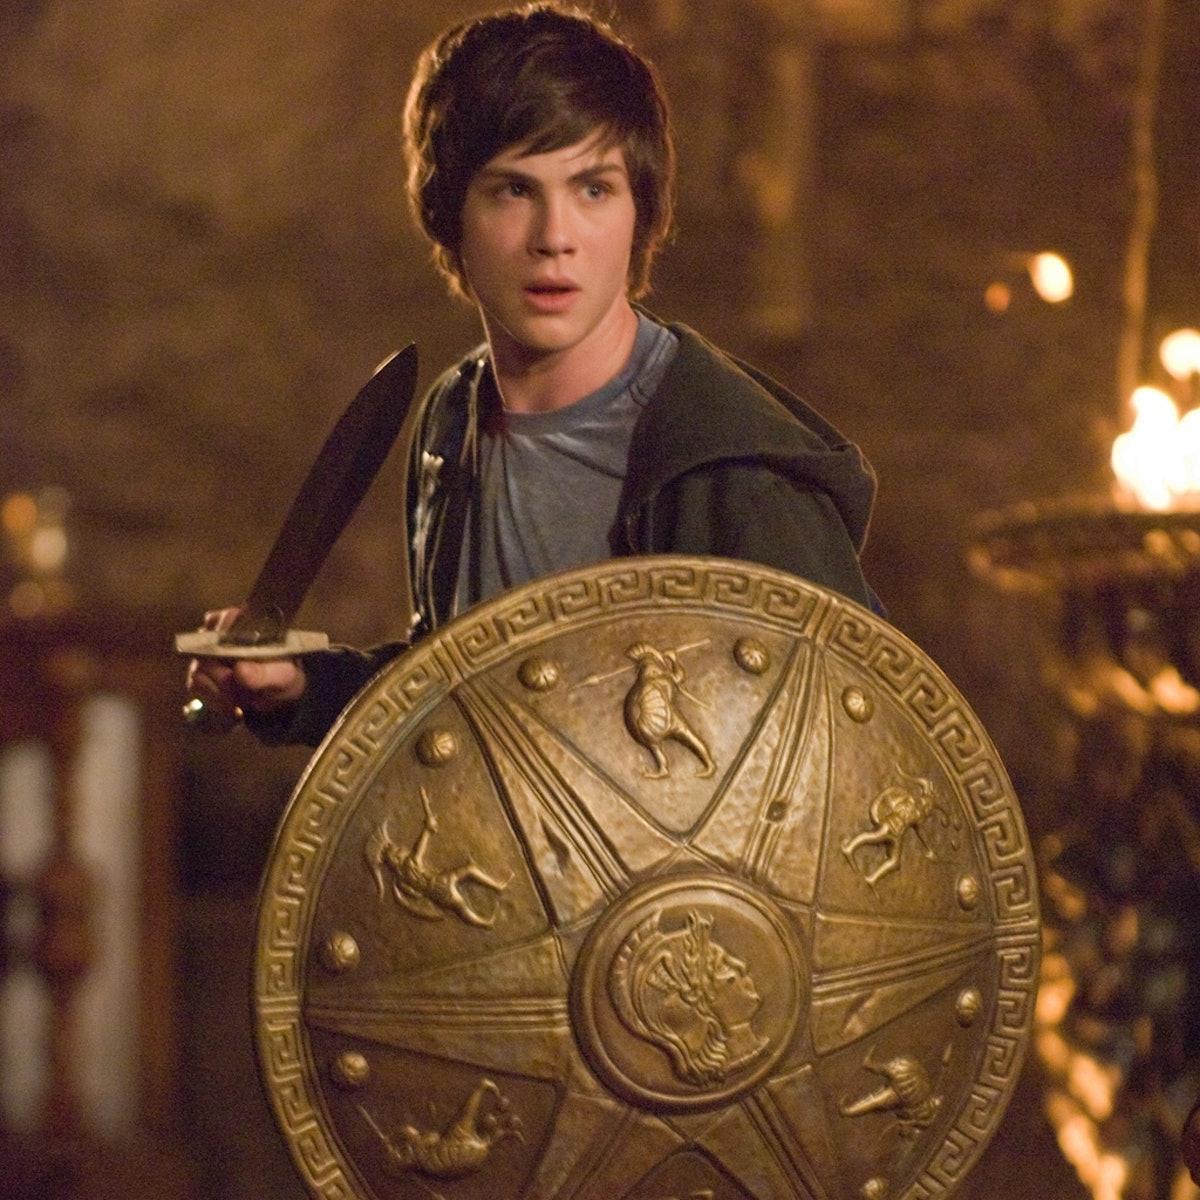 Logan Lerman as Percy Jackson.